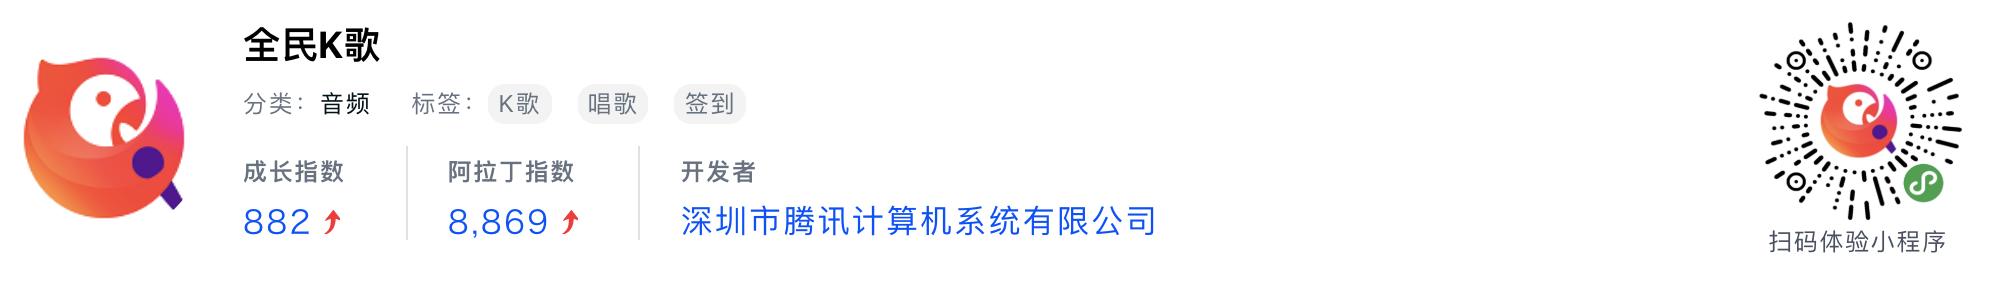 WeChatミニプログラム最新ランキングTOP20【2019年6月版】11位 :全民k歌